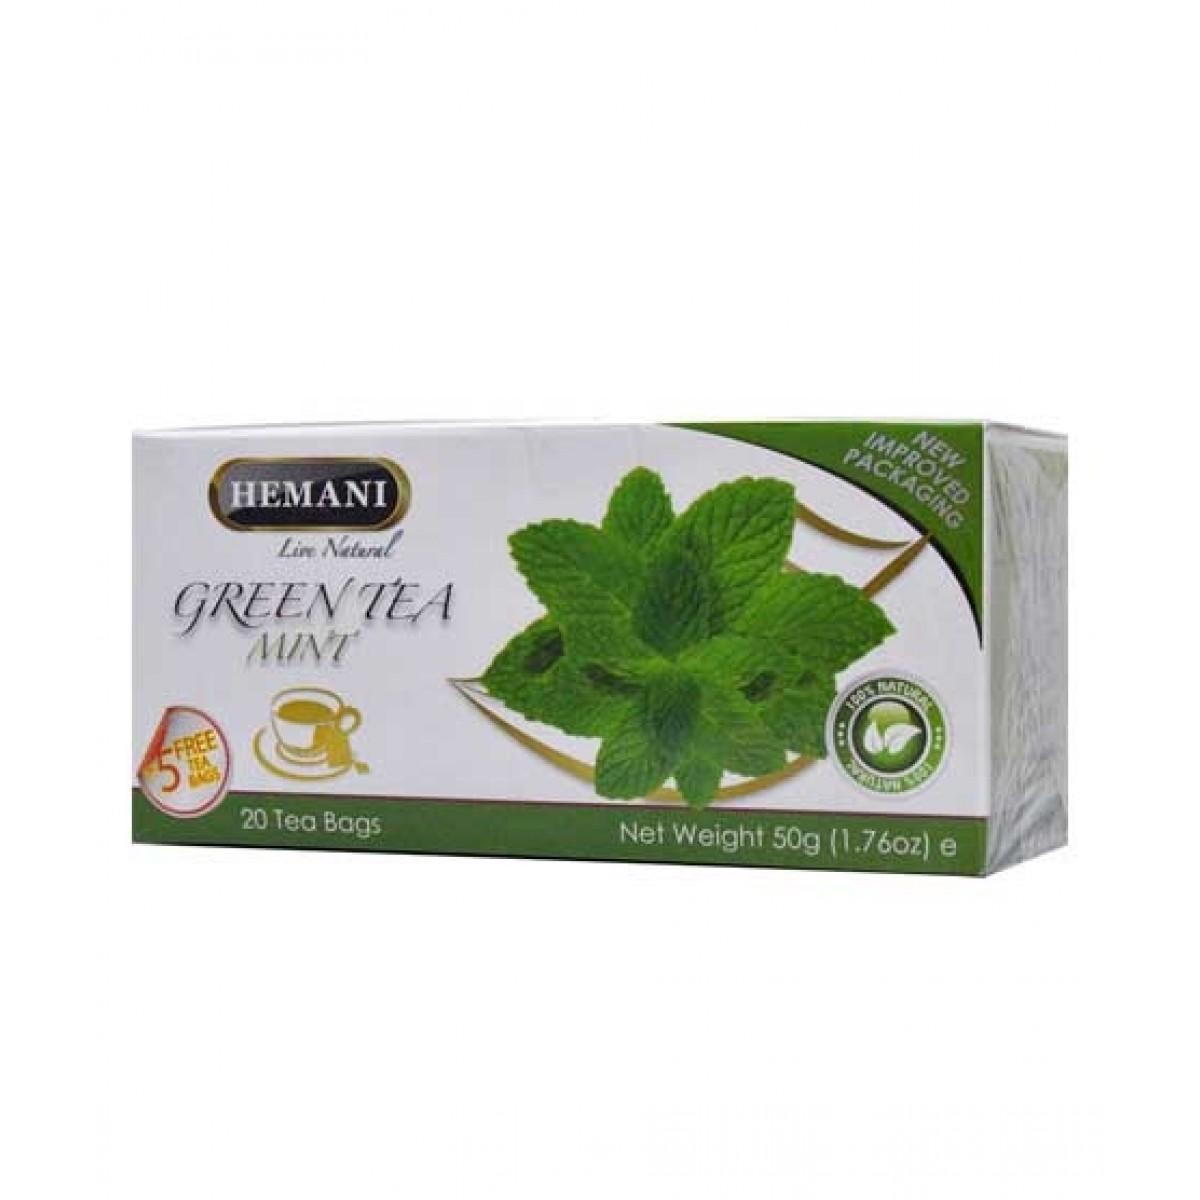 Hemani Mint Green Tea 20 Tea Bags